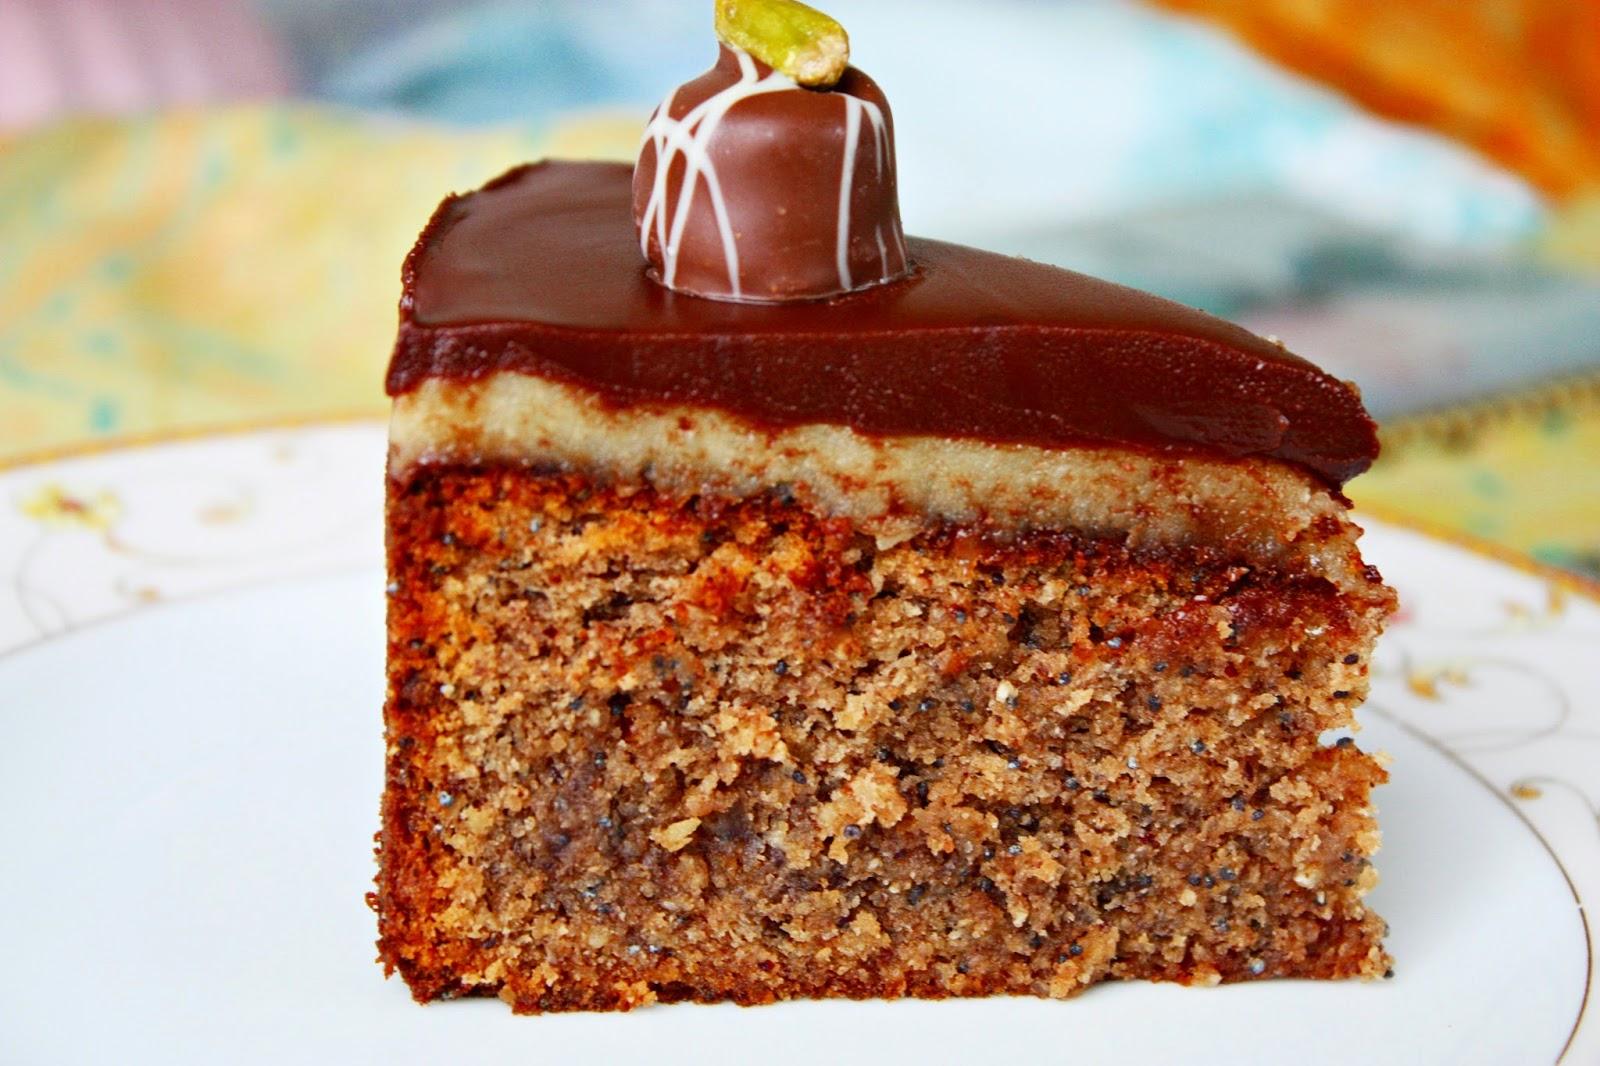 Nuss Schokoladen Torte mit Marzipan